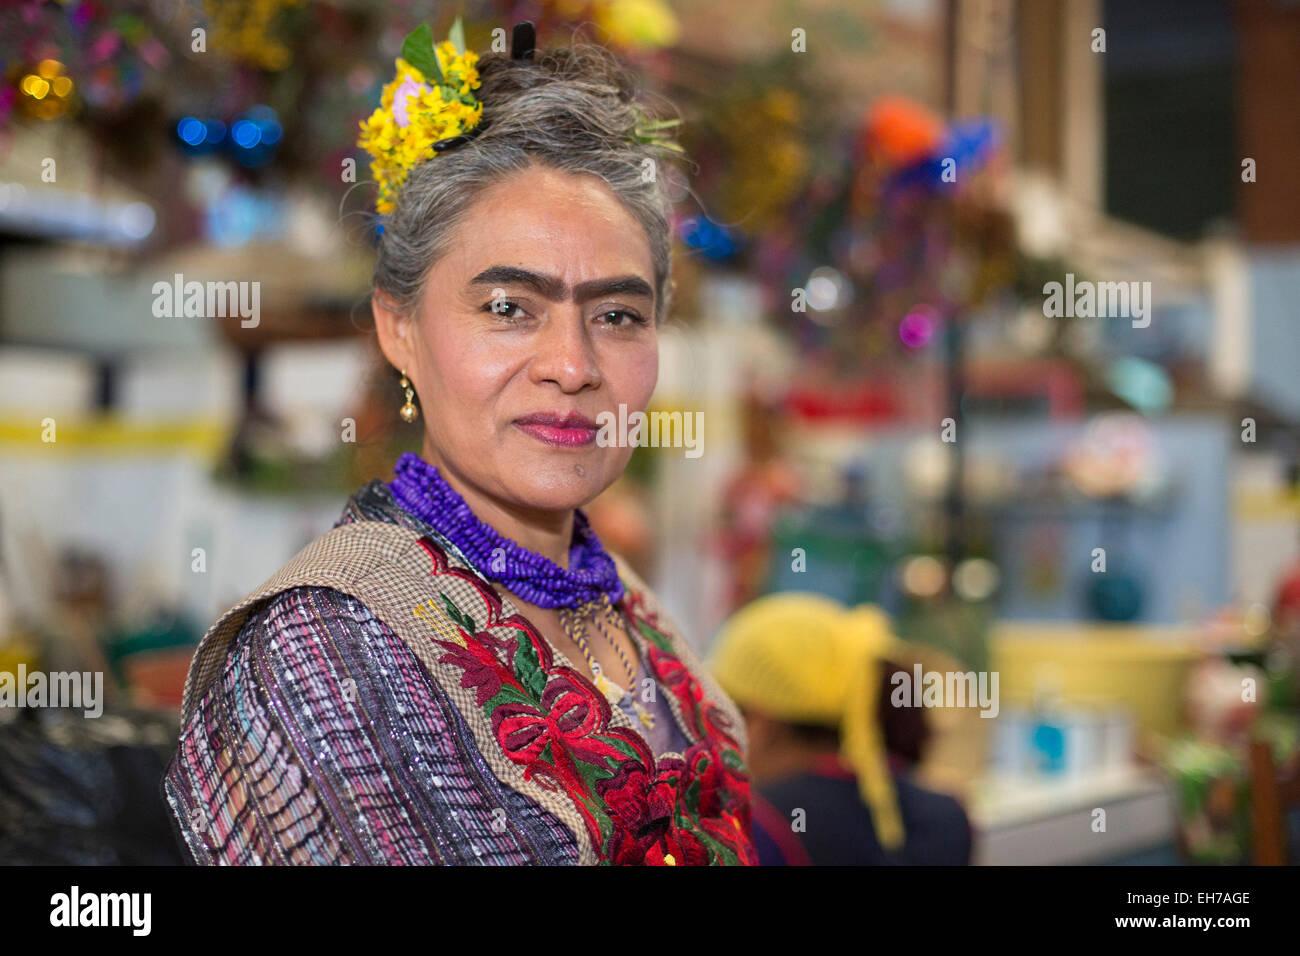 Ocotlán de Morelos, Oaxaca, Mexico - Beatriz Vásquez Goméz, a Frida Kahlo look-alike, runs La Cocina - Stock Image